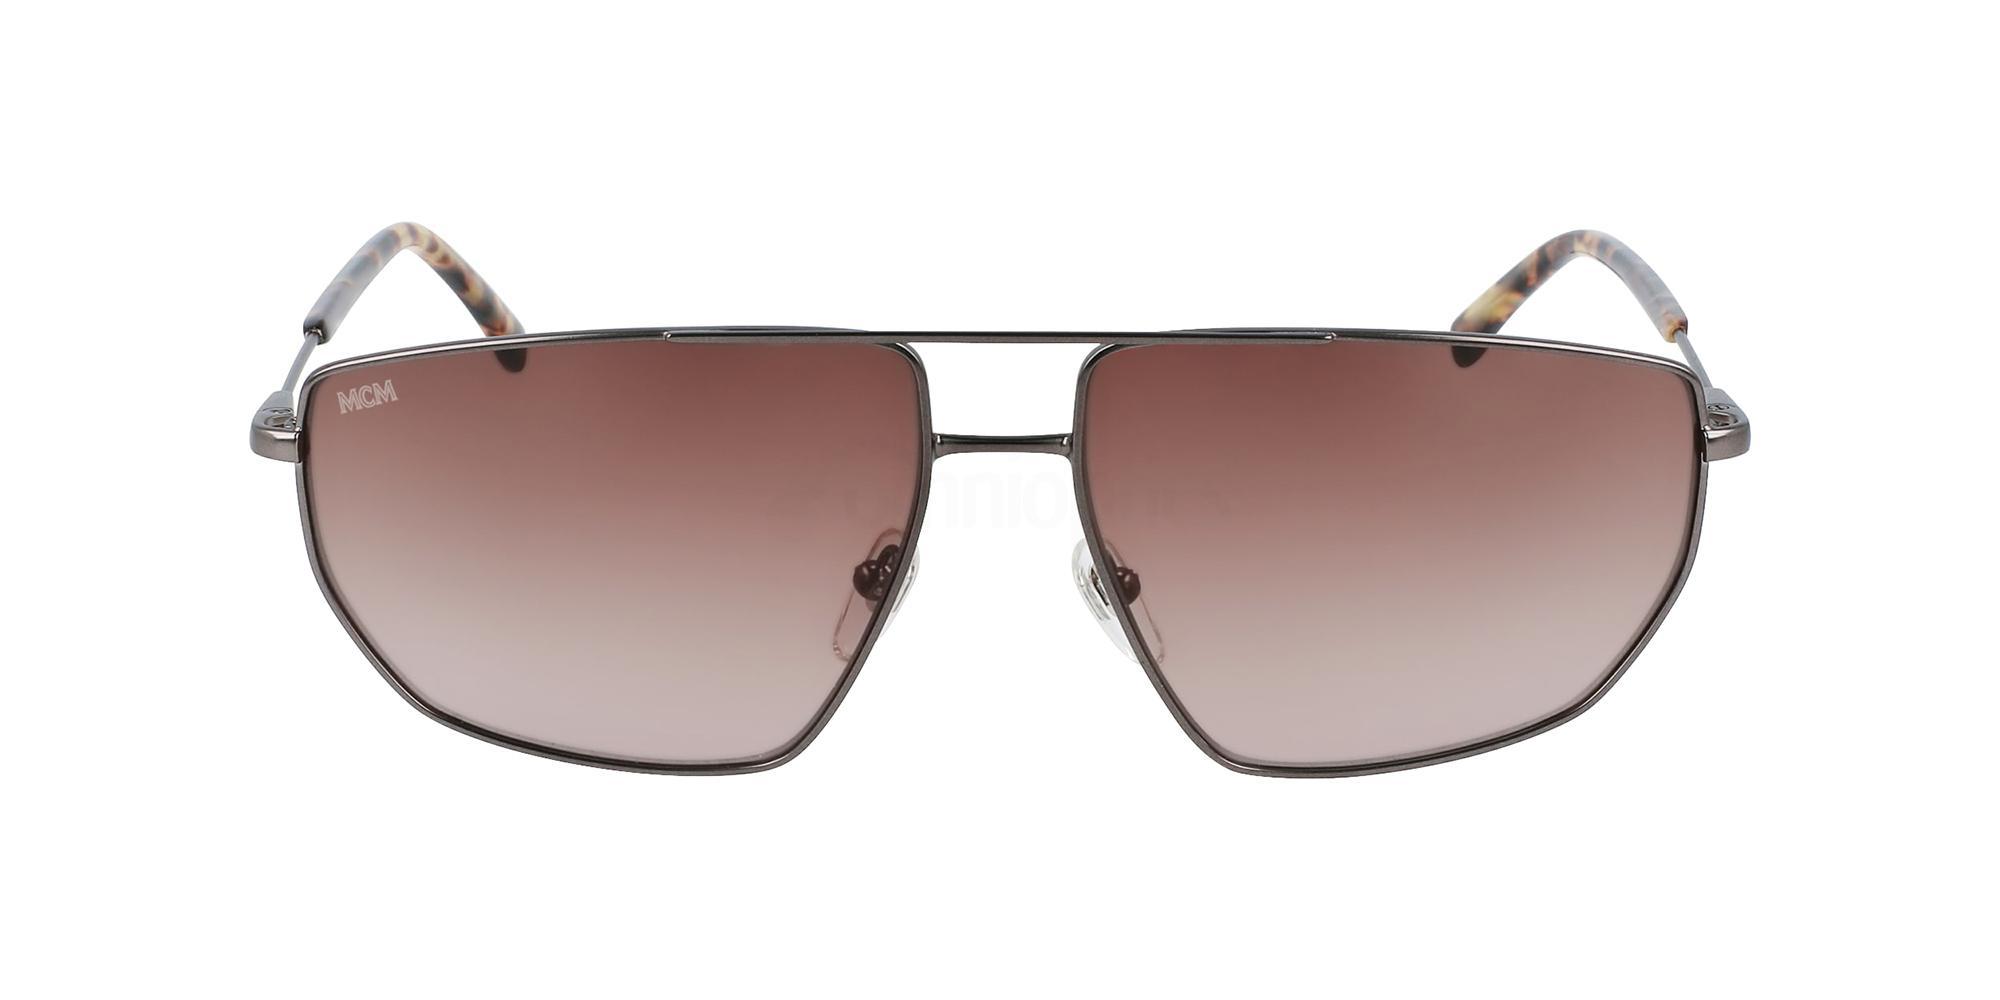 069 MCM151S Sunglasses, MCM